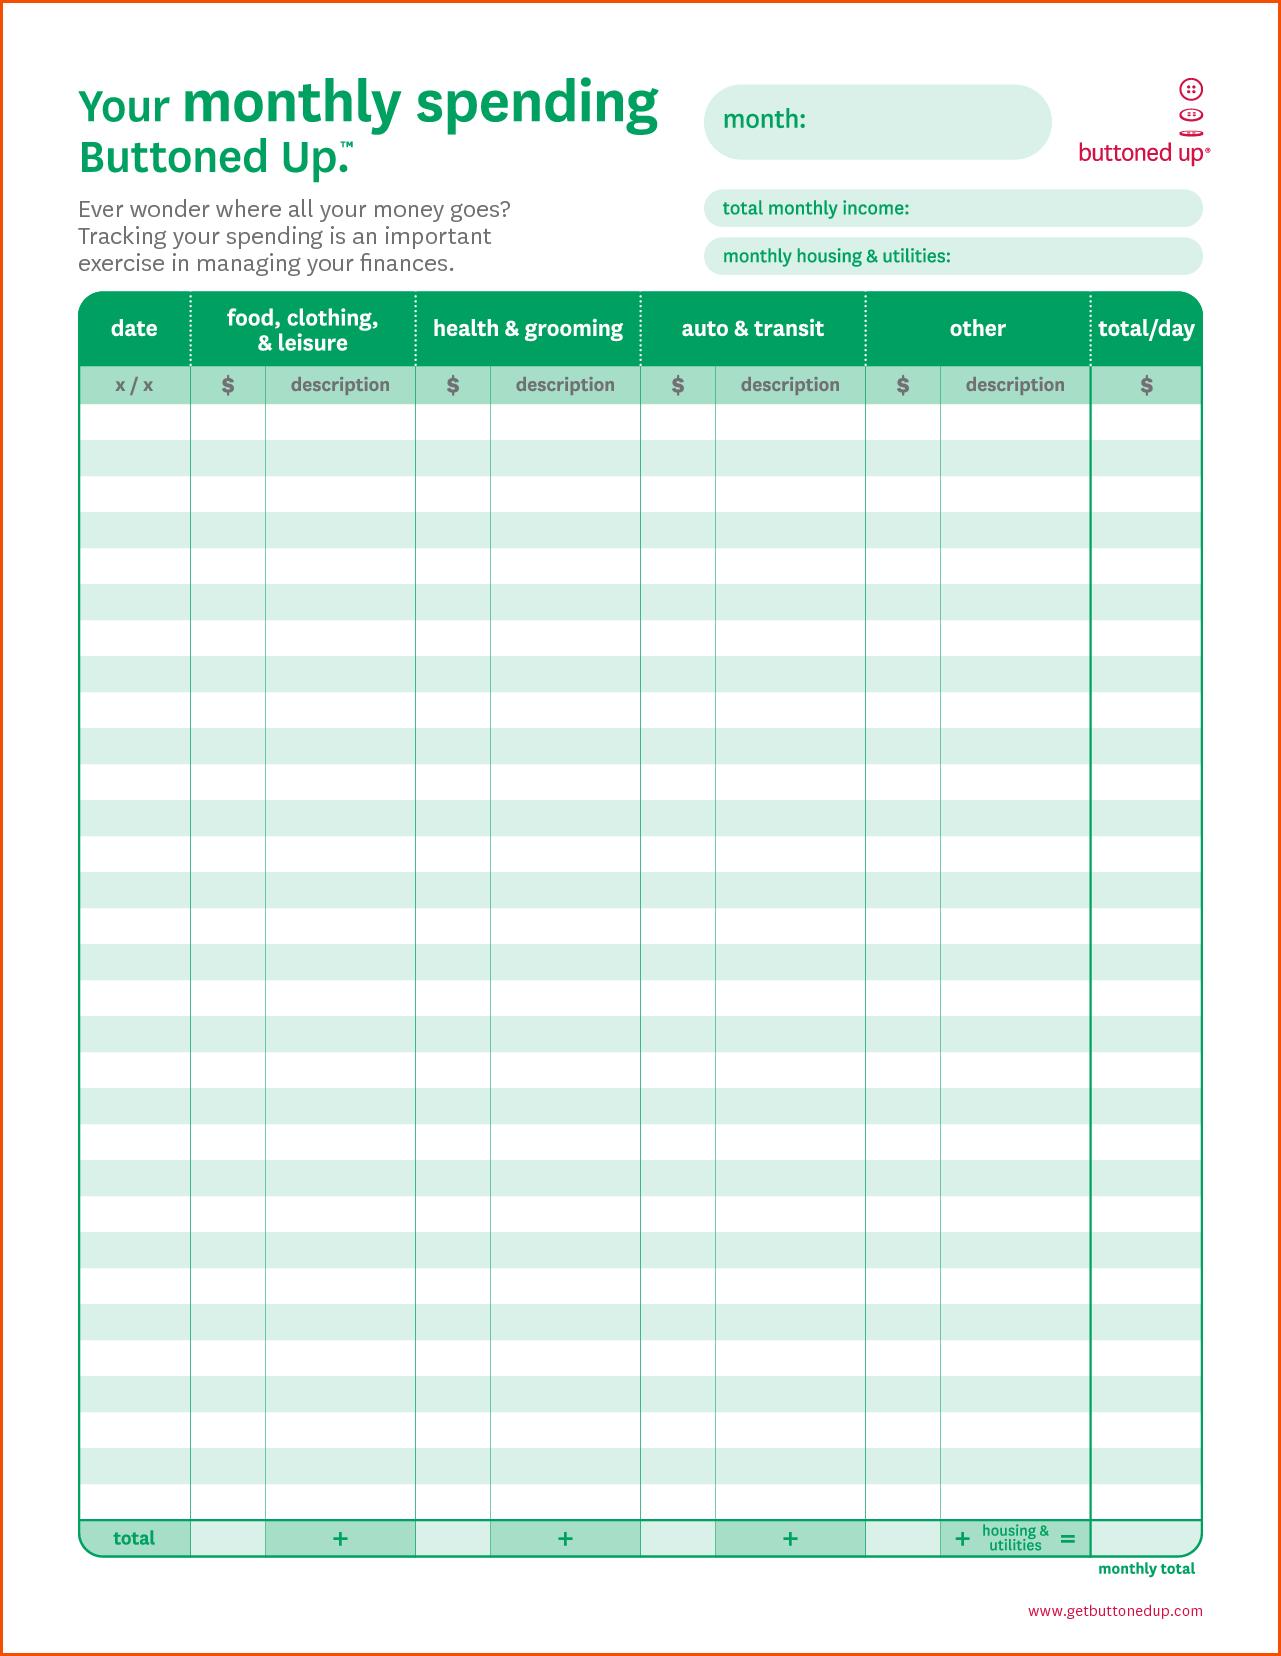 Monthly Budget Worksheet Printablememo Templates Word | Memo | Monthly Spending Worksheet Printable